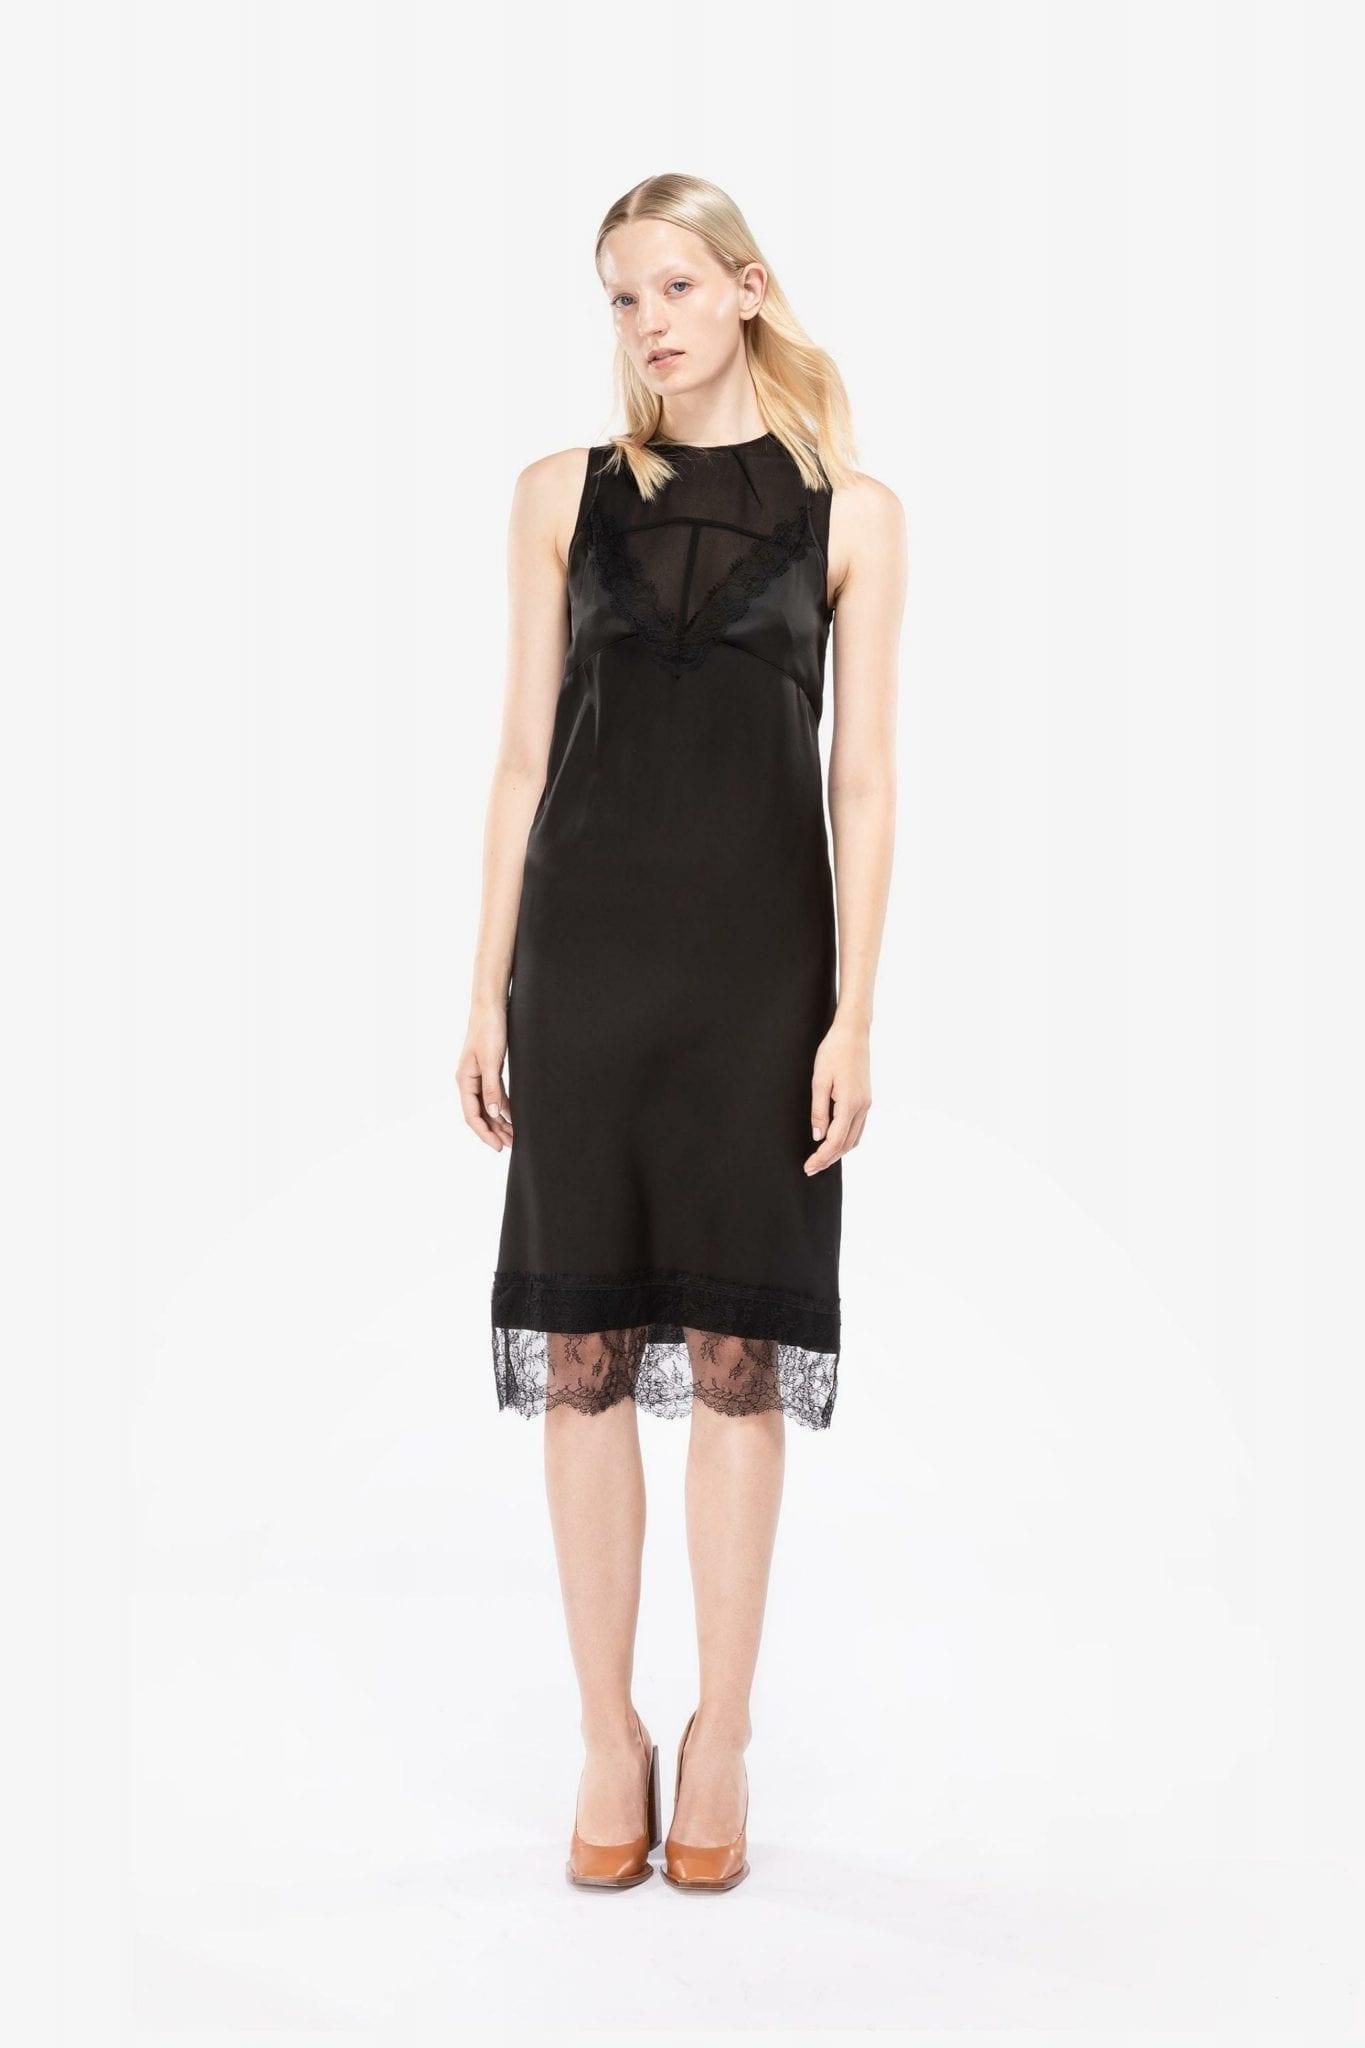 NO21 Sheer Panel Dress